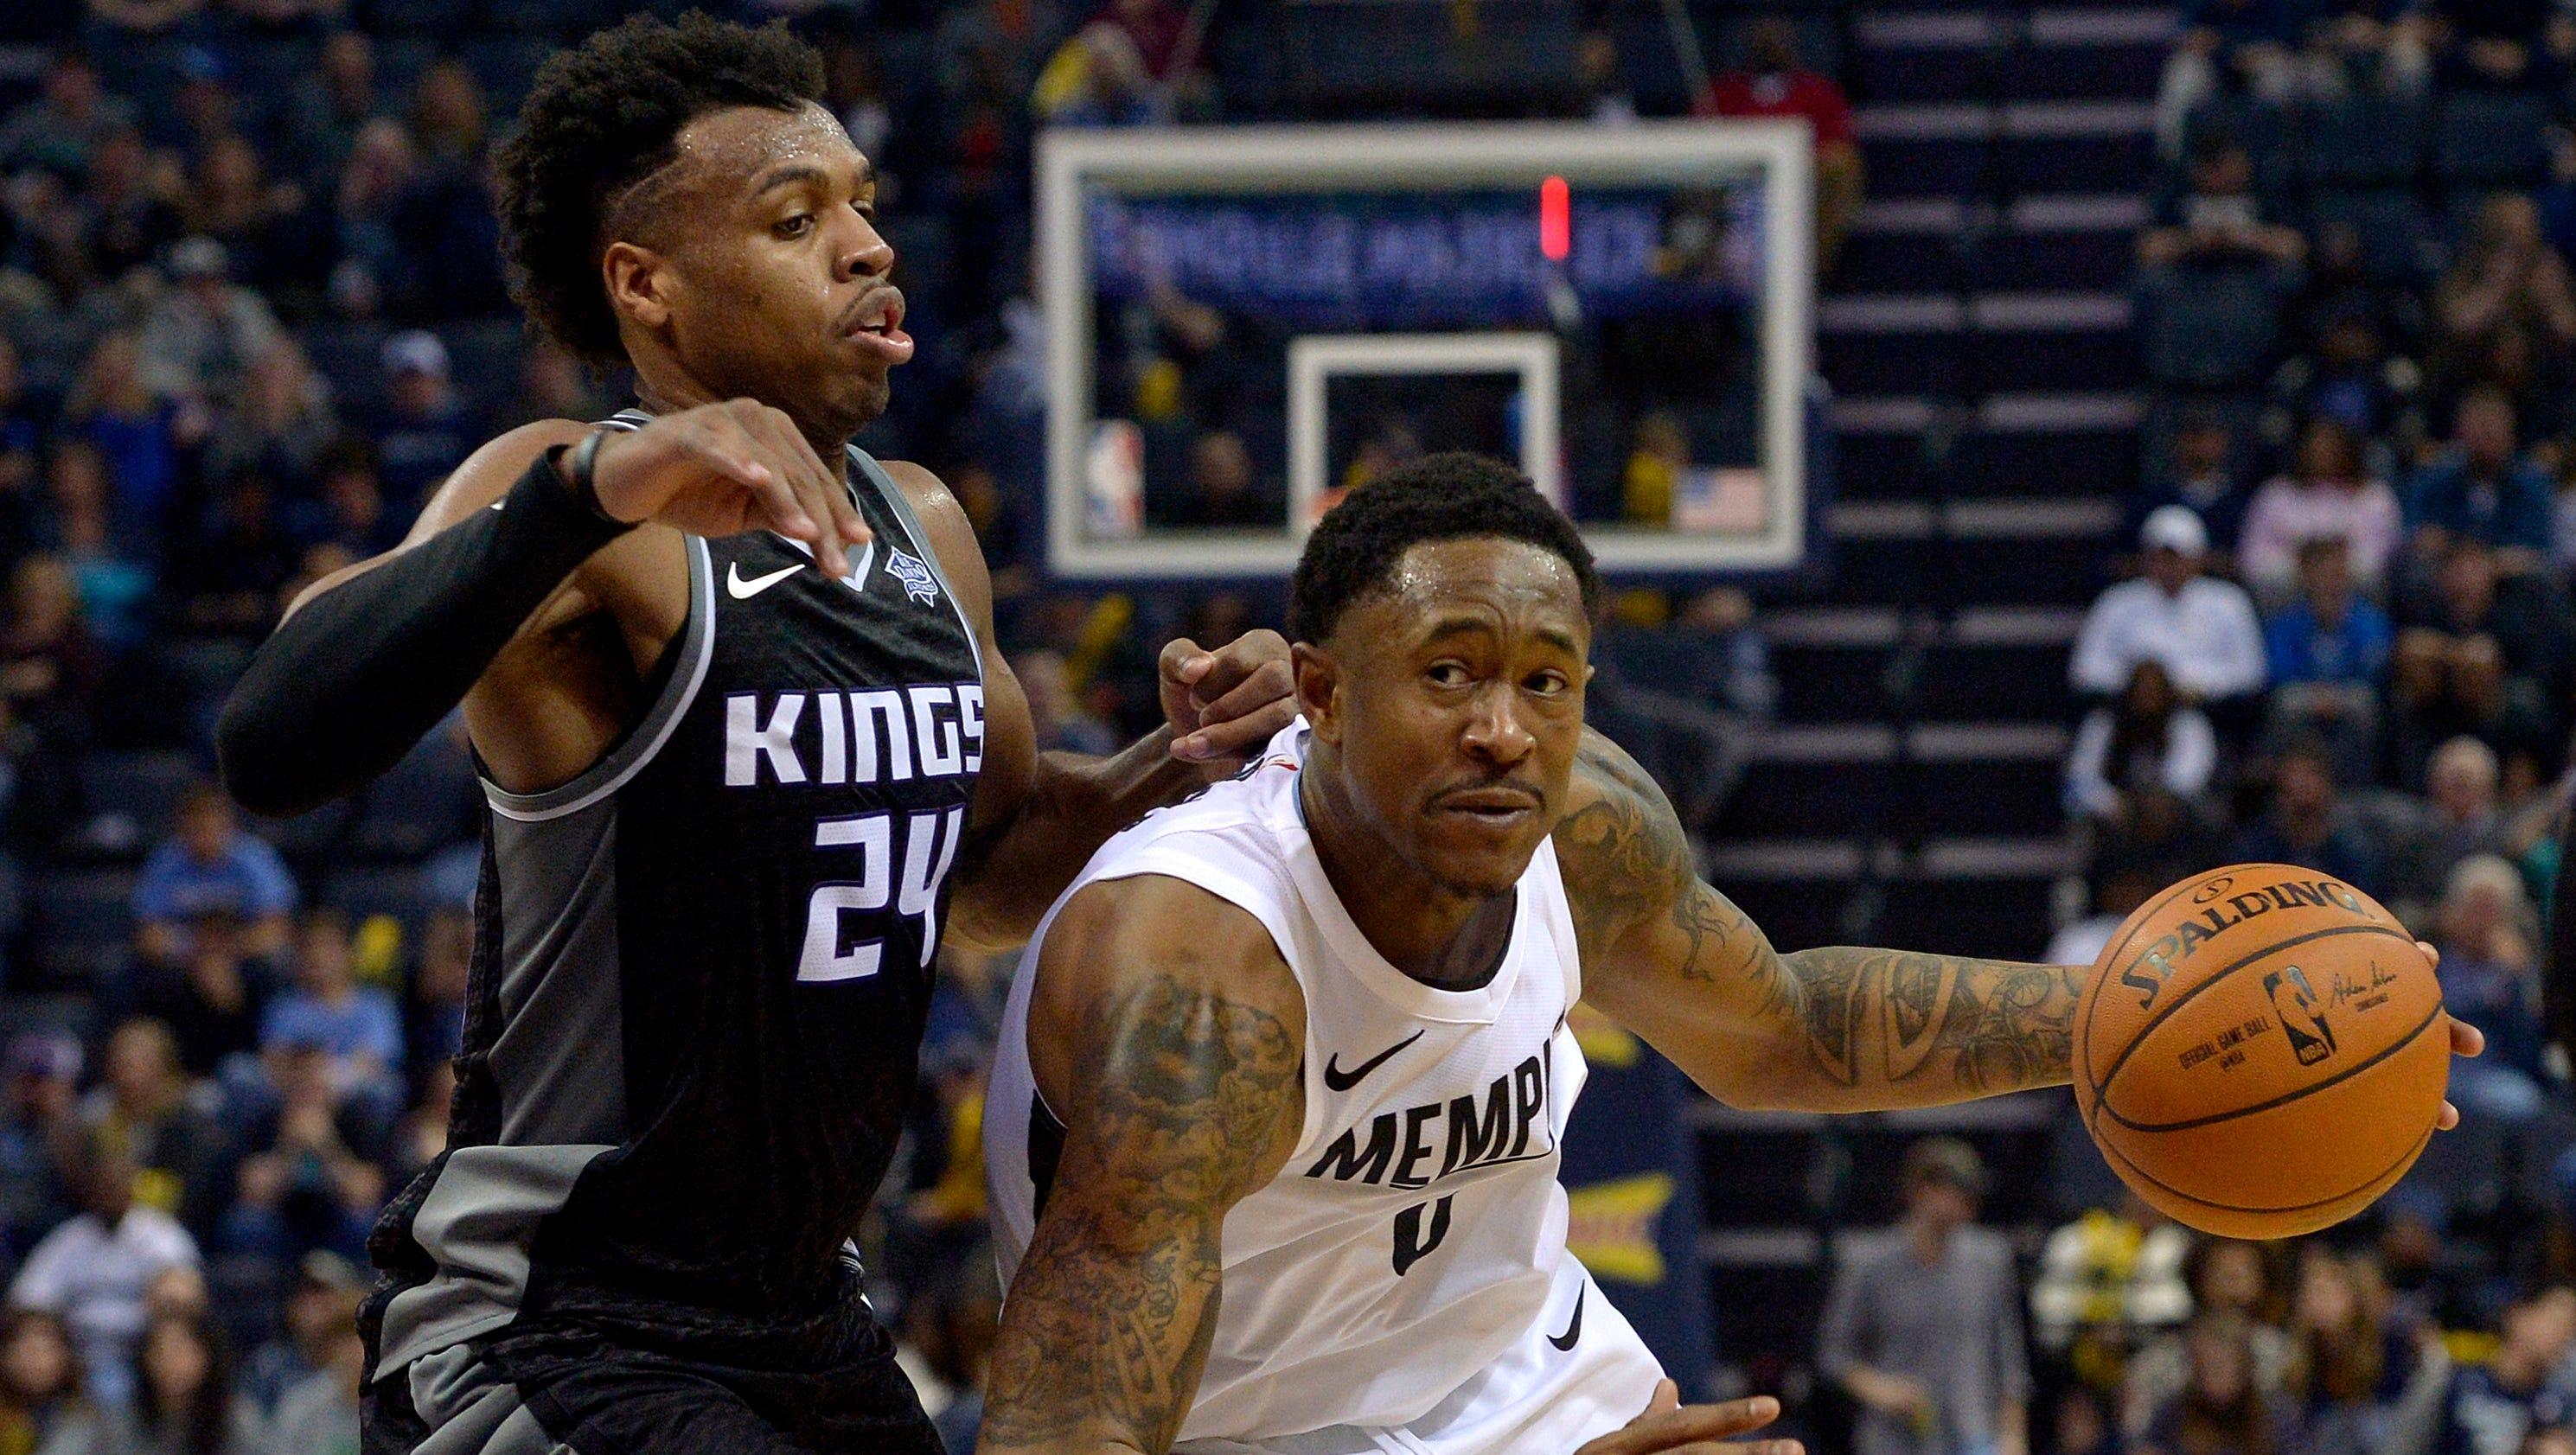 636586512540411894-kings-grizzlies-basketball